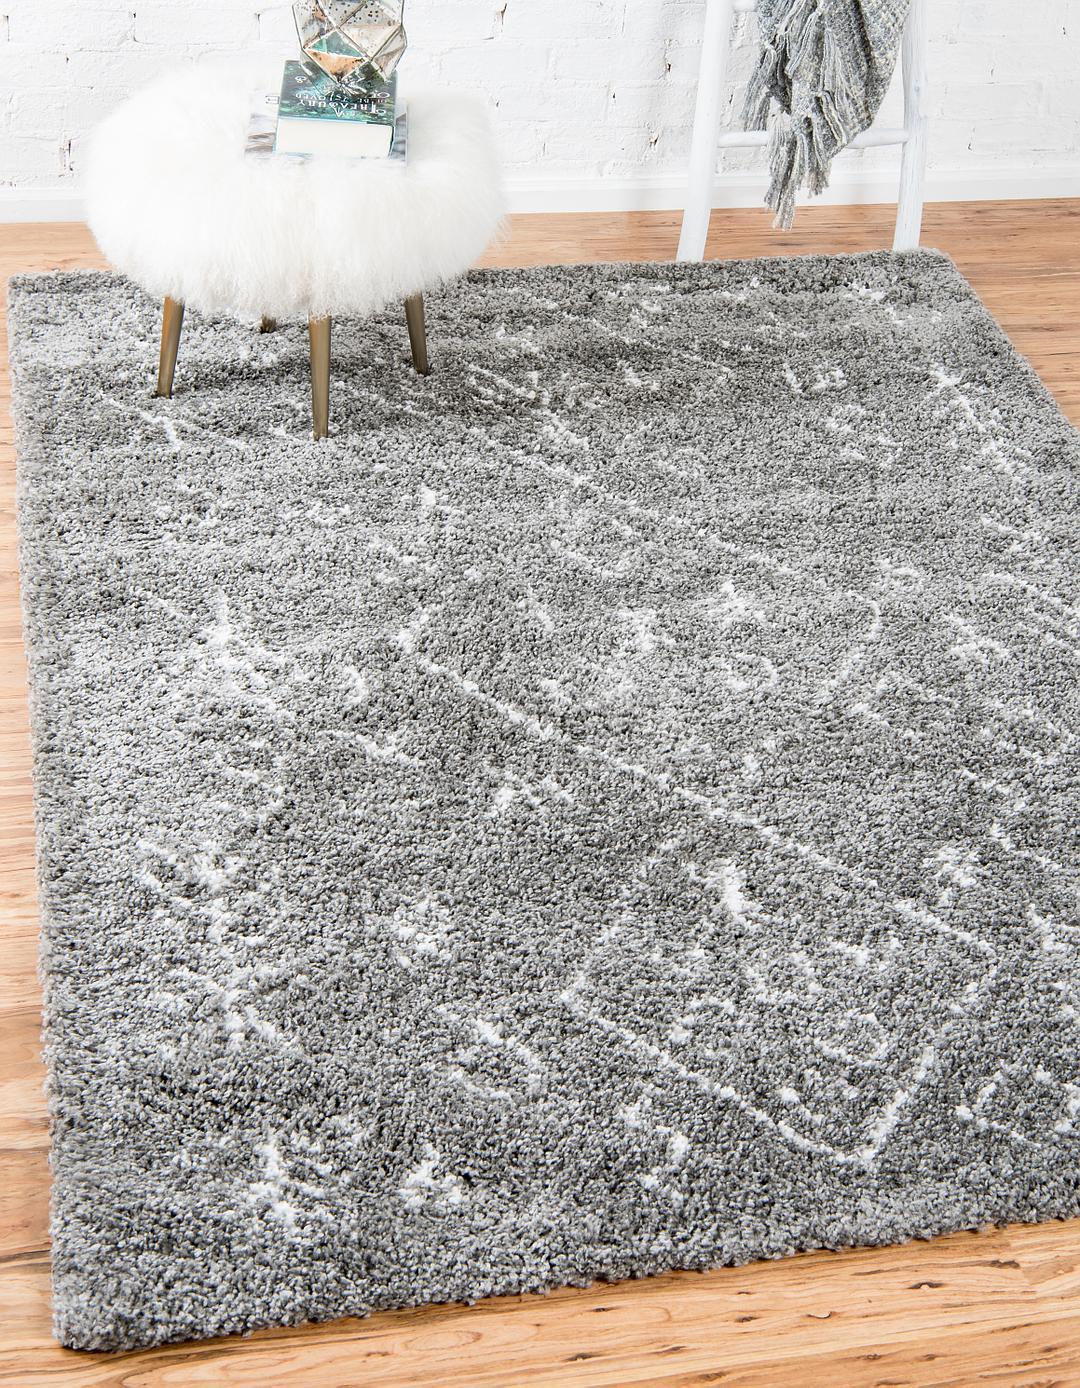 gray 9' x 12' marrakesh shag rug | area rugs | esalerugs